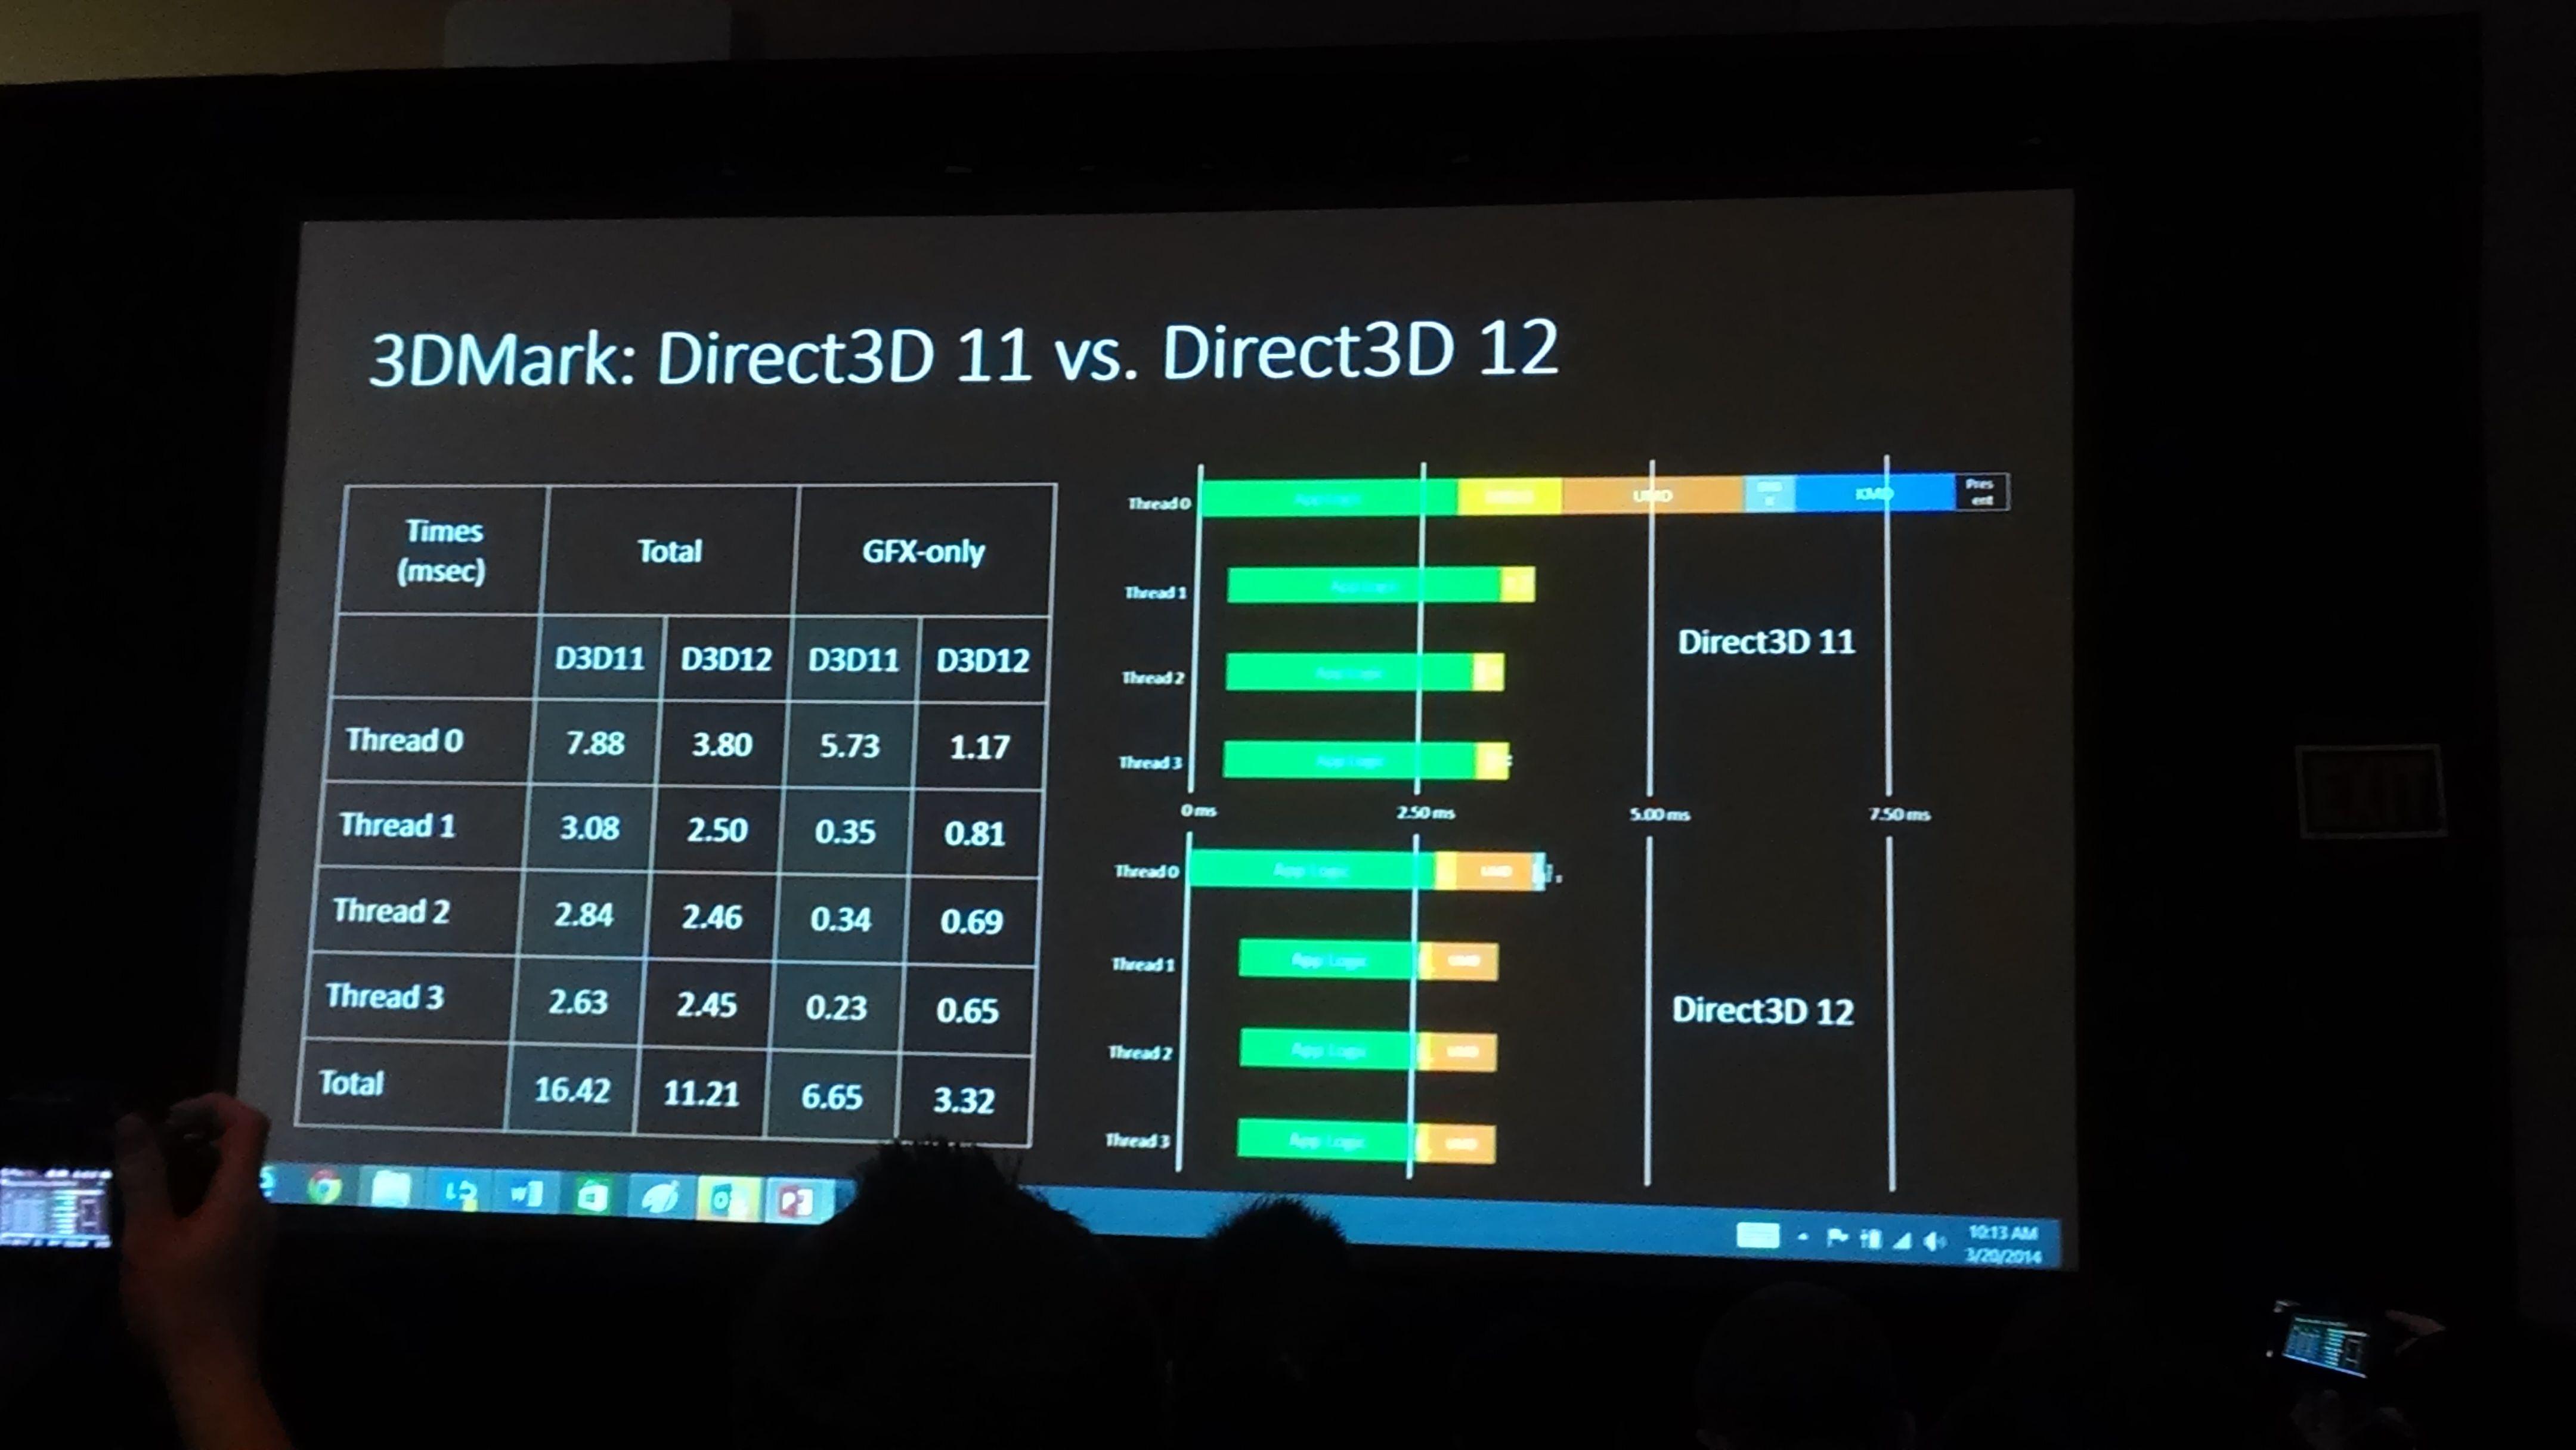 3dmark directx 12 api performance is 1300% than directx 11